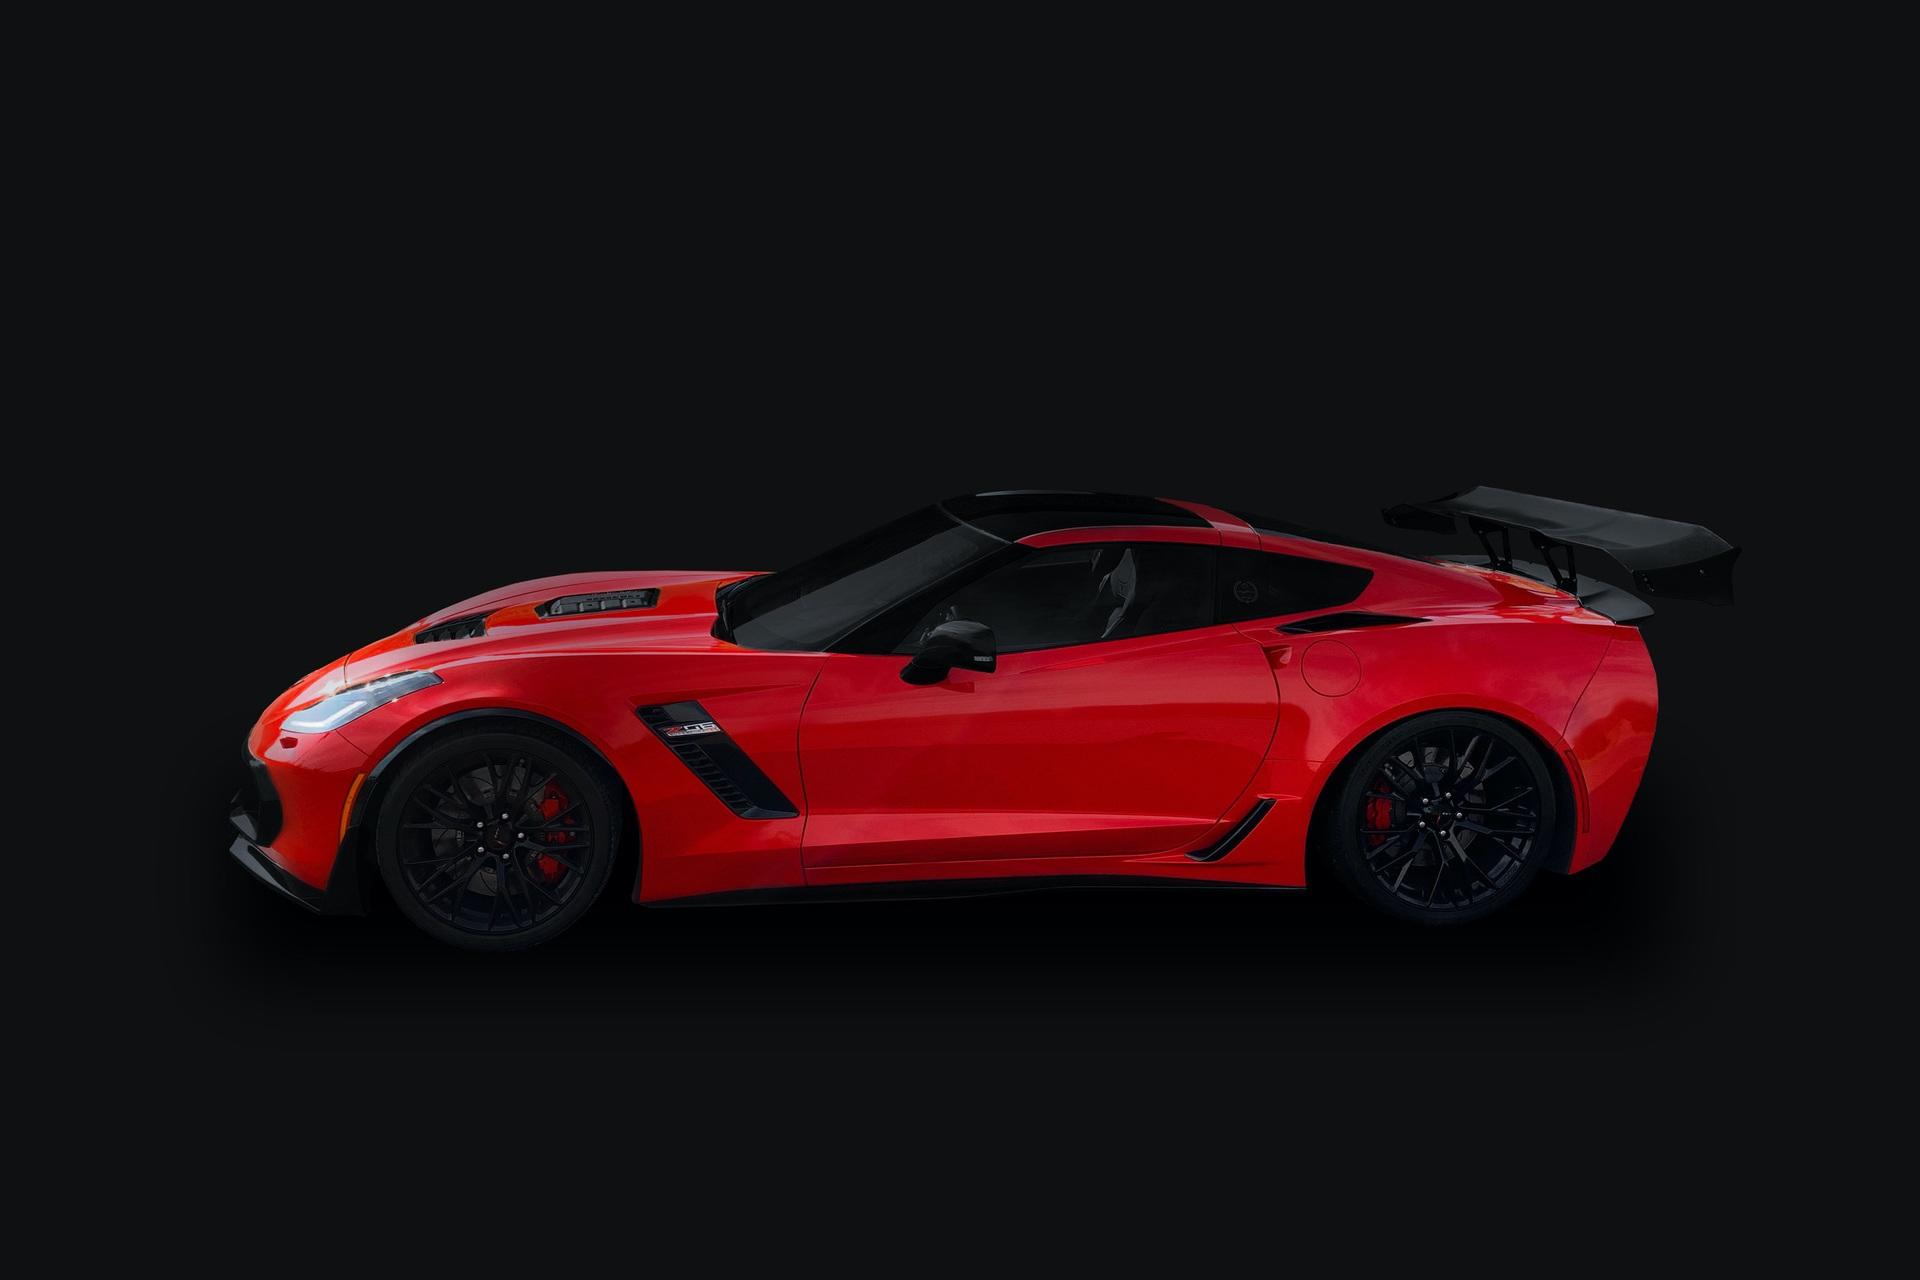 Callaway_C7_Corvette_limited_edition_0004